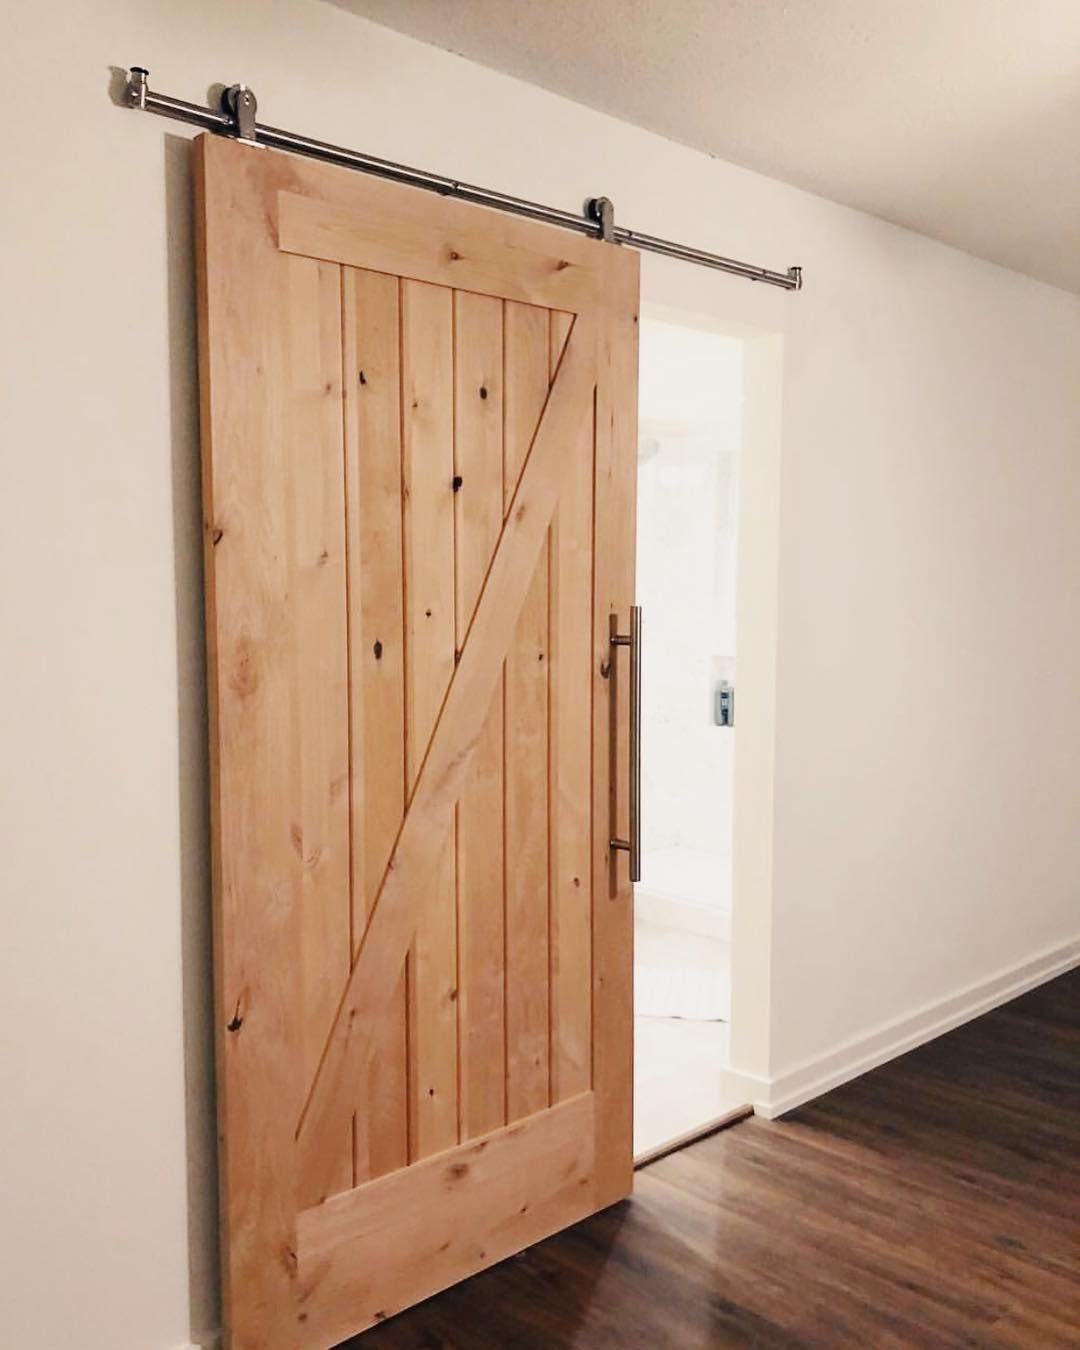 Simpson Barn Door Doors Interior Barn Door Installation Barn Doors Sliding